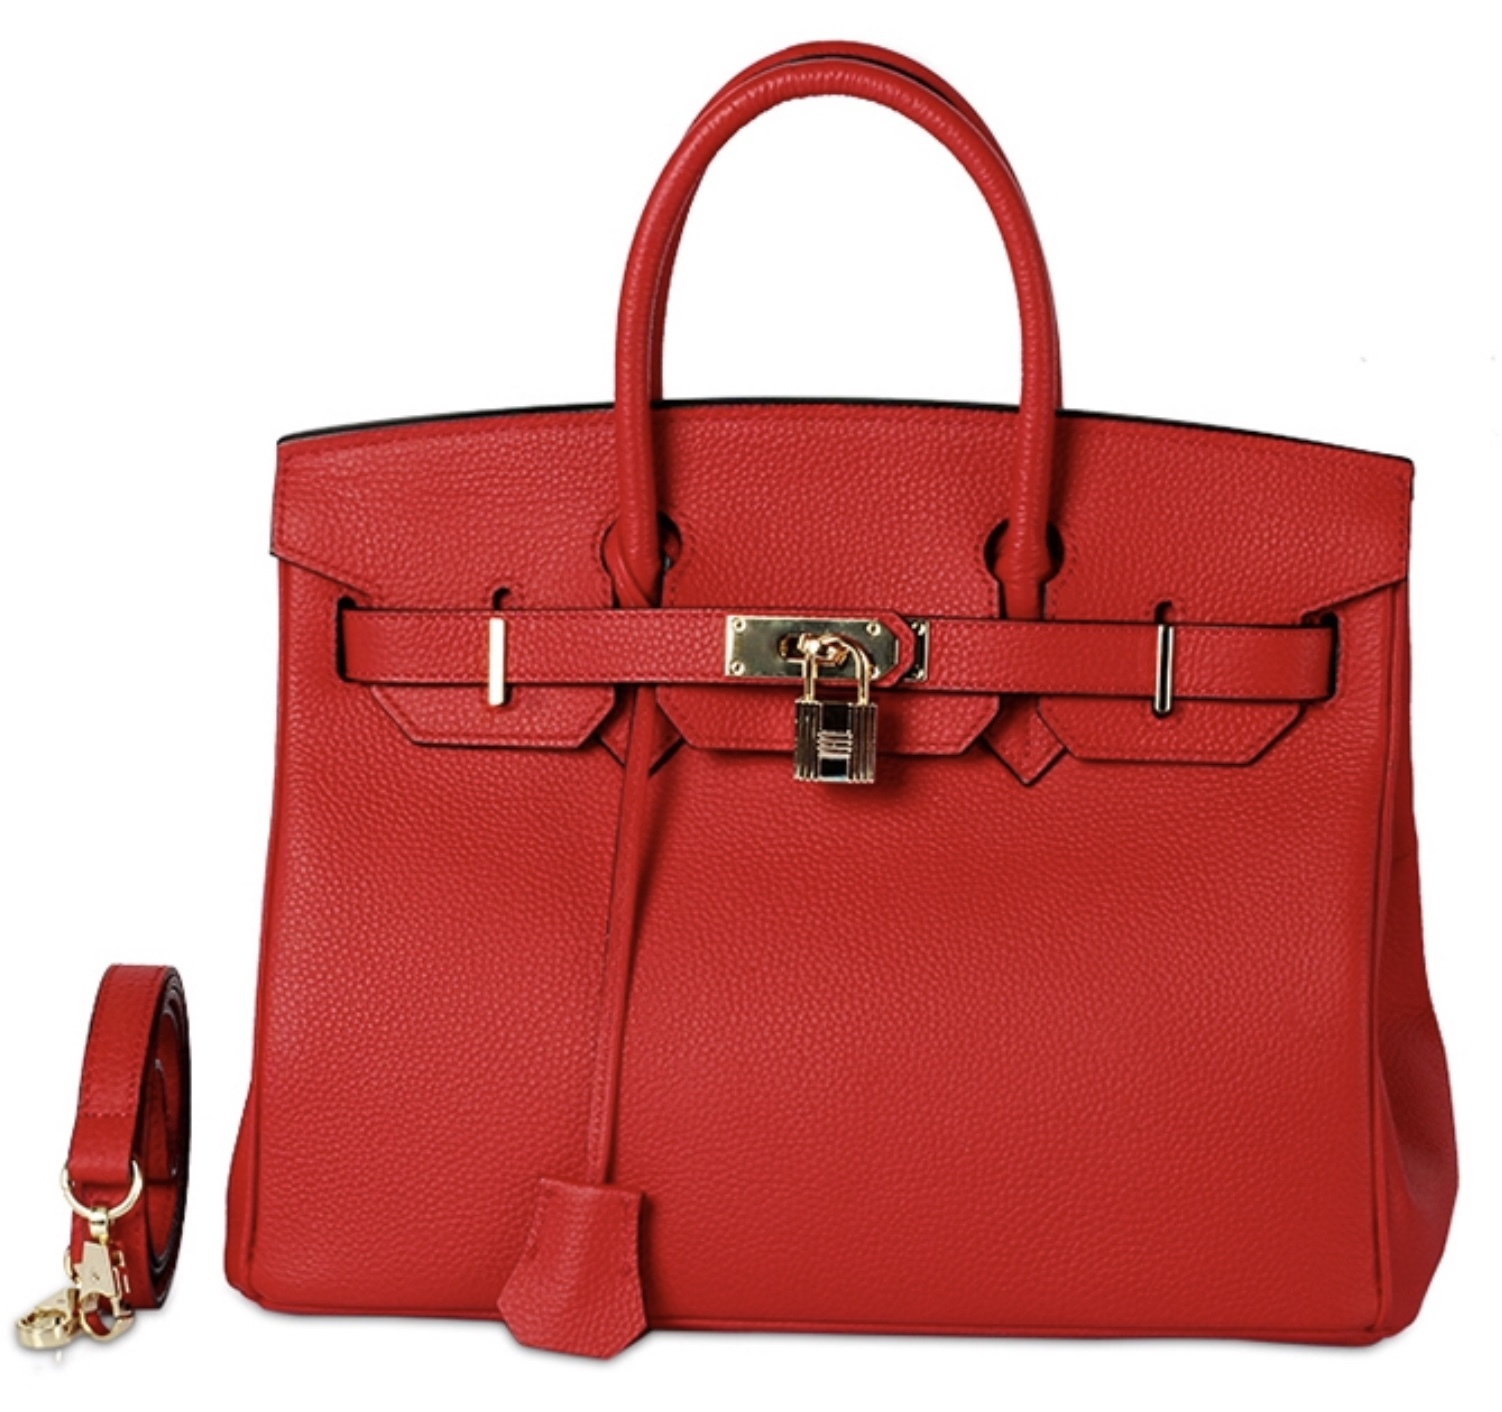 30cm Pebbled Leather Birkin Style Lock and Key Satchel Handbag Purse 1946M